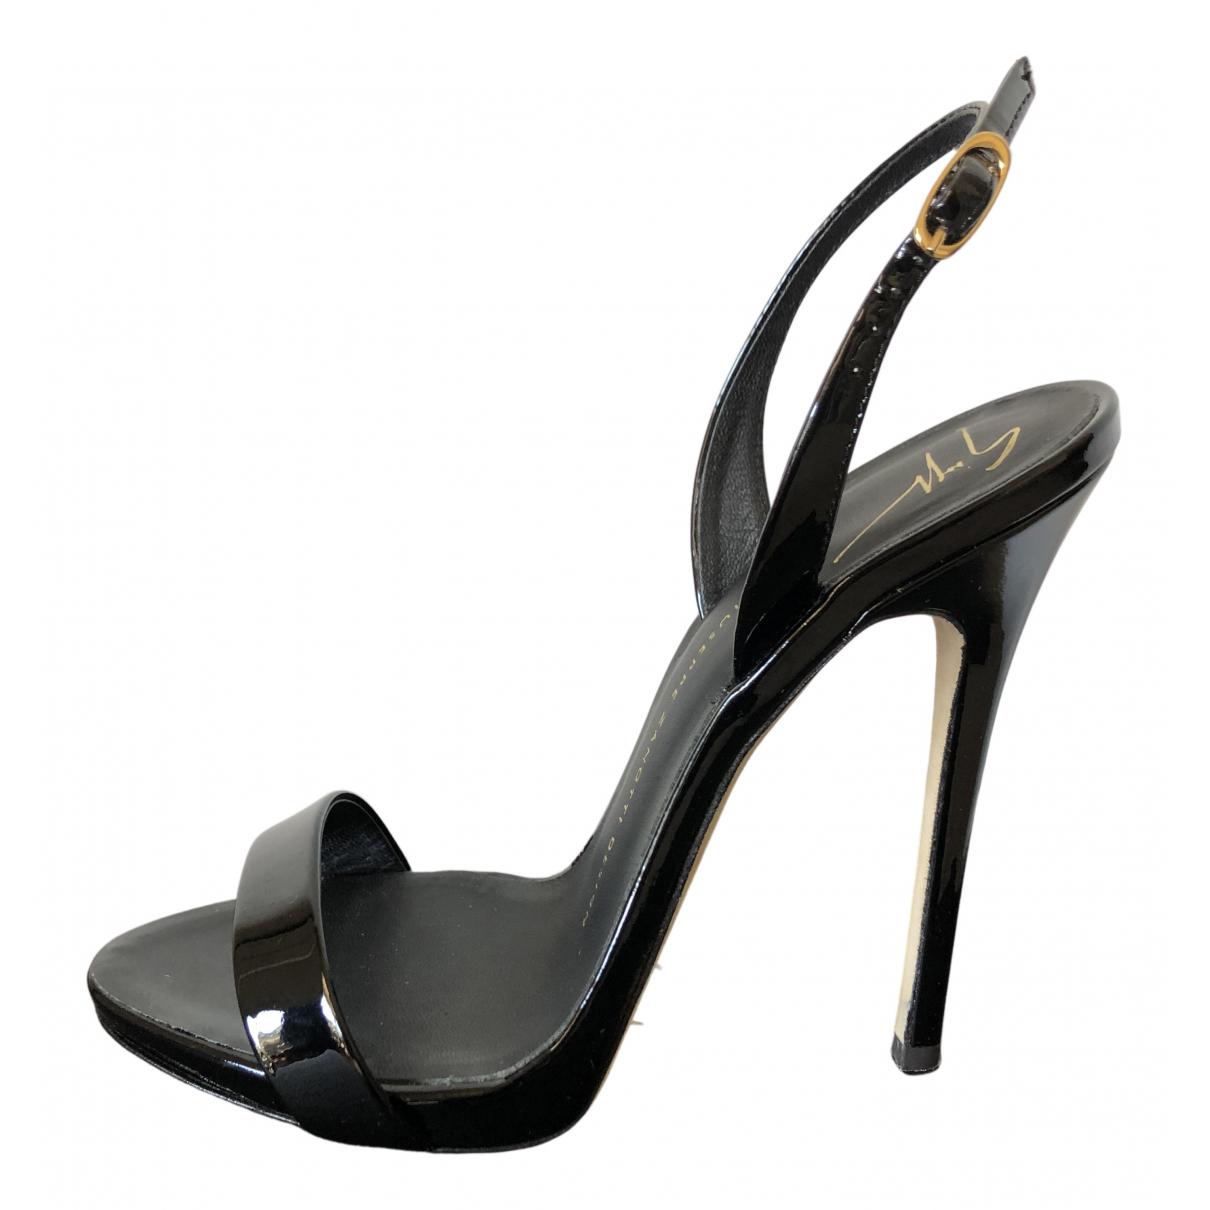 Giuseppe Zanotti N Black Patent leather Sandals for Women 37 EU